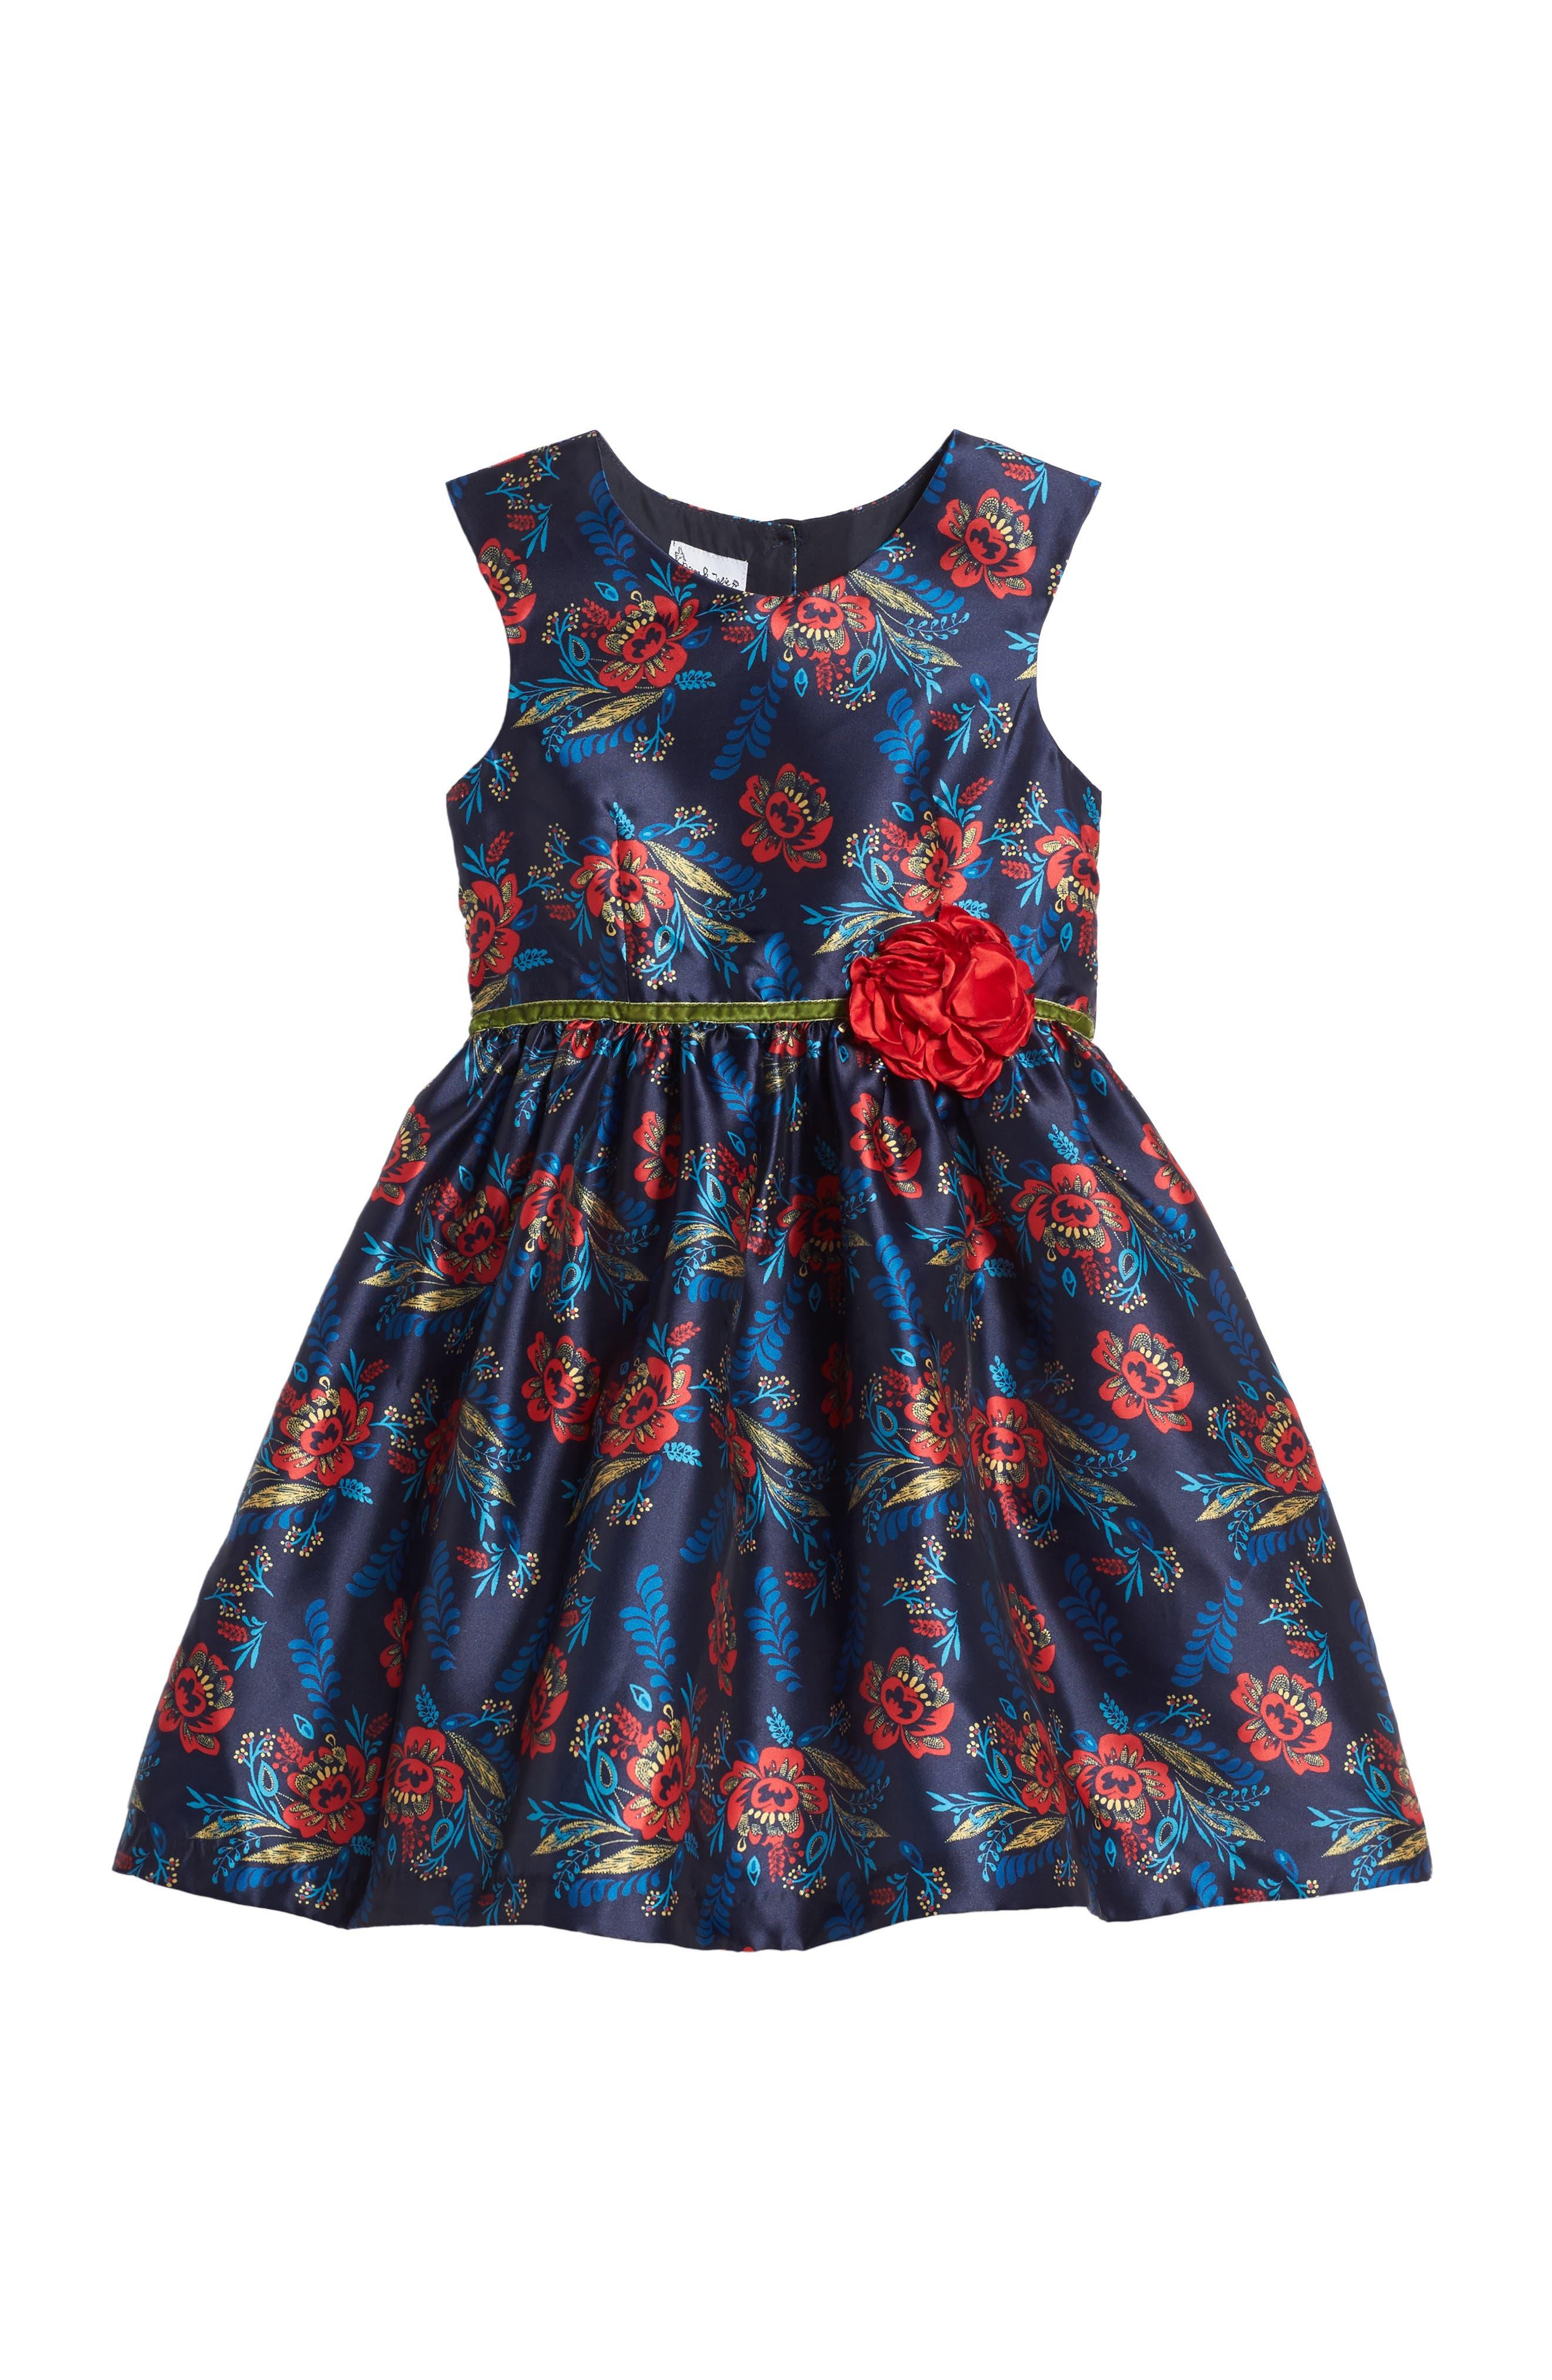 Main Image - Pippa & Julie Floral Print Shantung Dress (Toddler Girls, Little Girls & Big Girls)